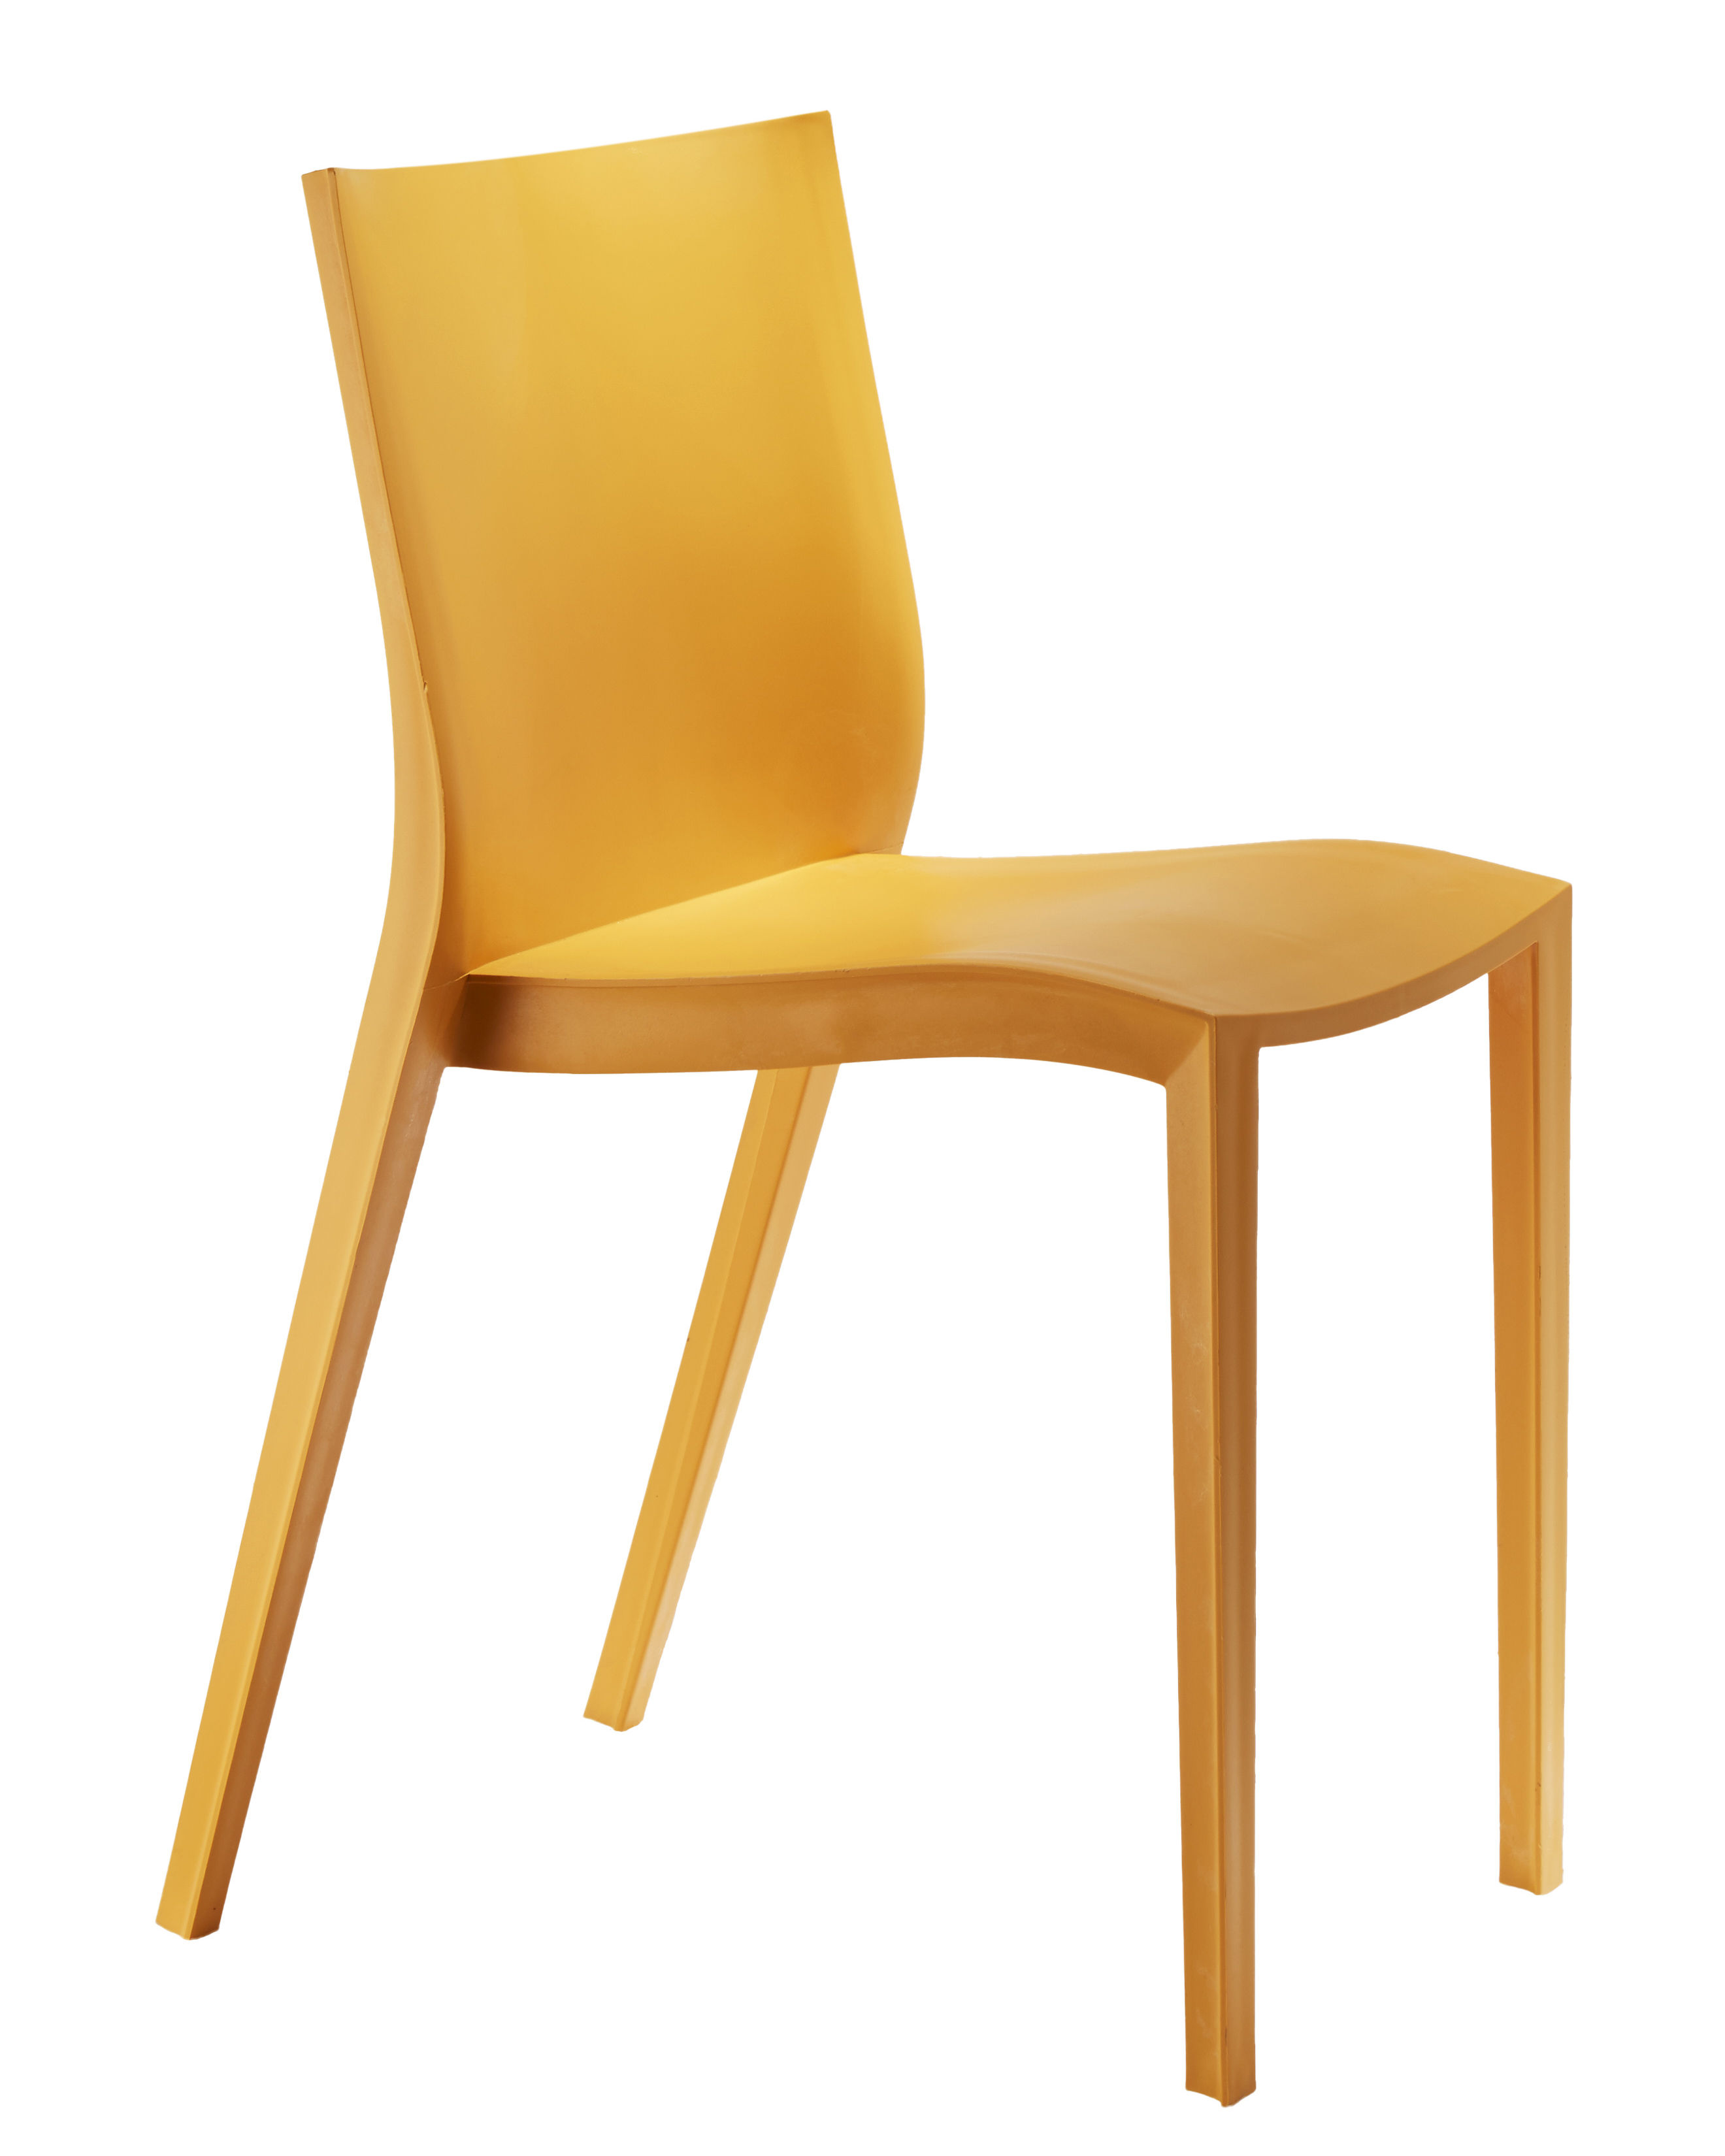 slick slick stapelbarer stuhl von philippe starck orange by xo made in design. Black Bedroom Furniture Sets. Home Design Ideas